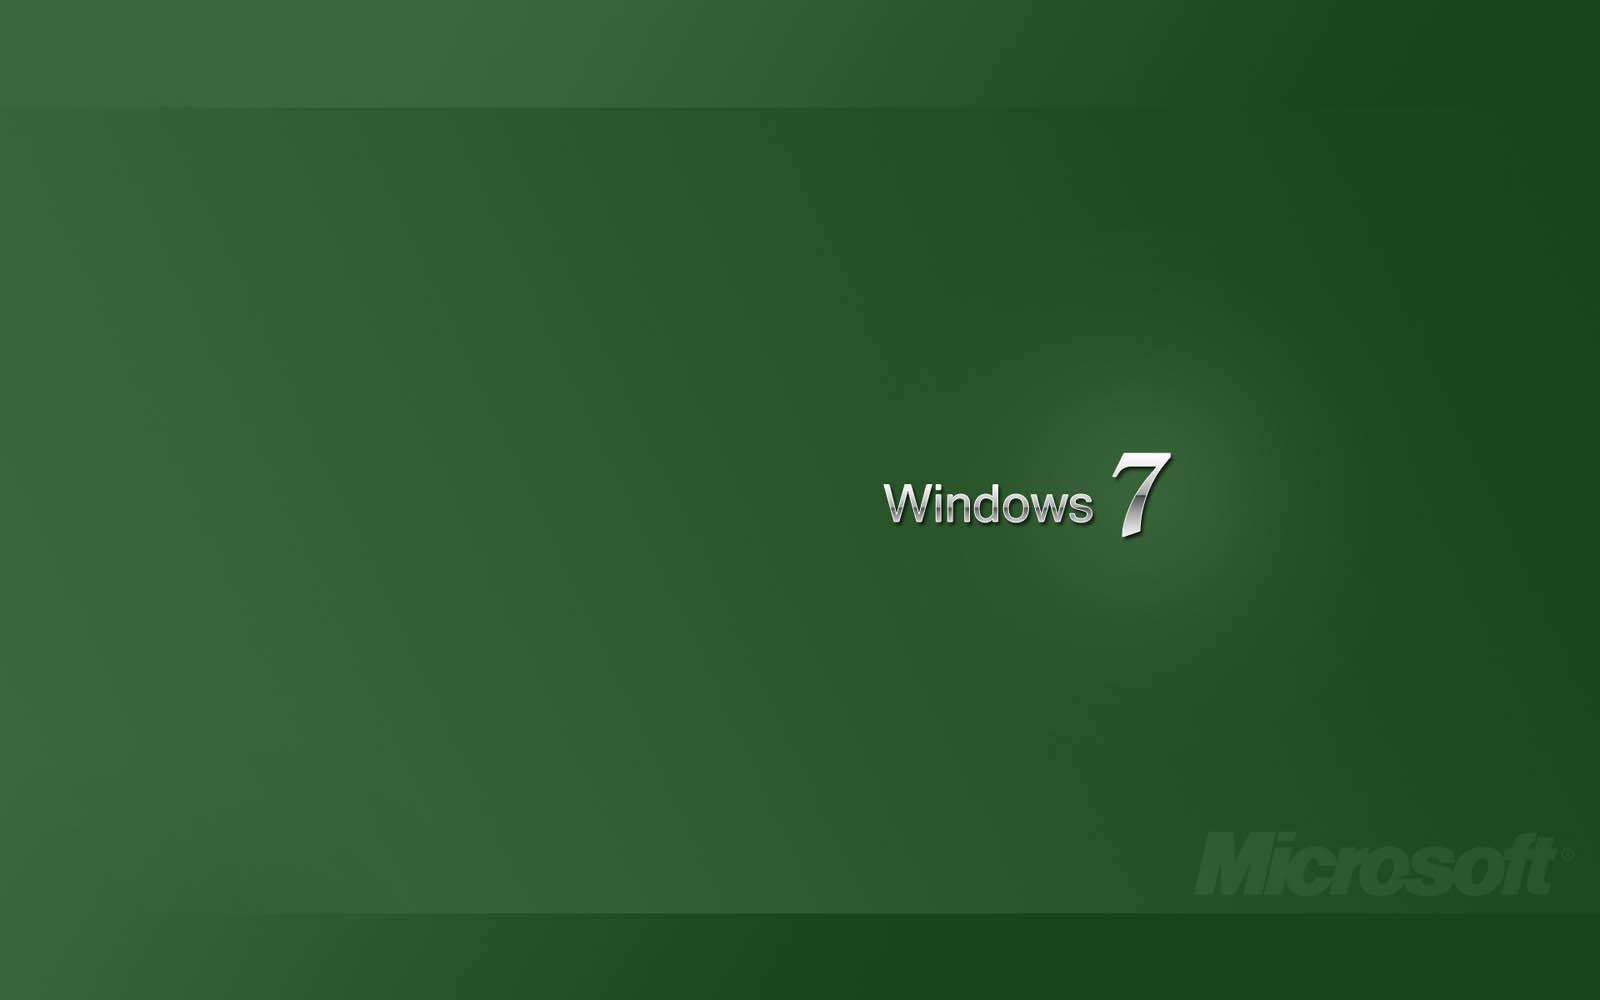 Wallpapers Green Windows 7 Wallpapers